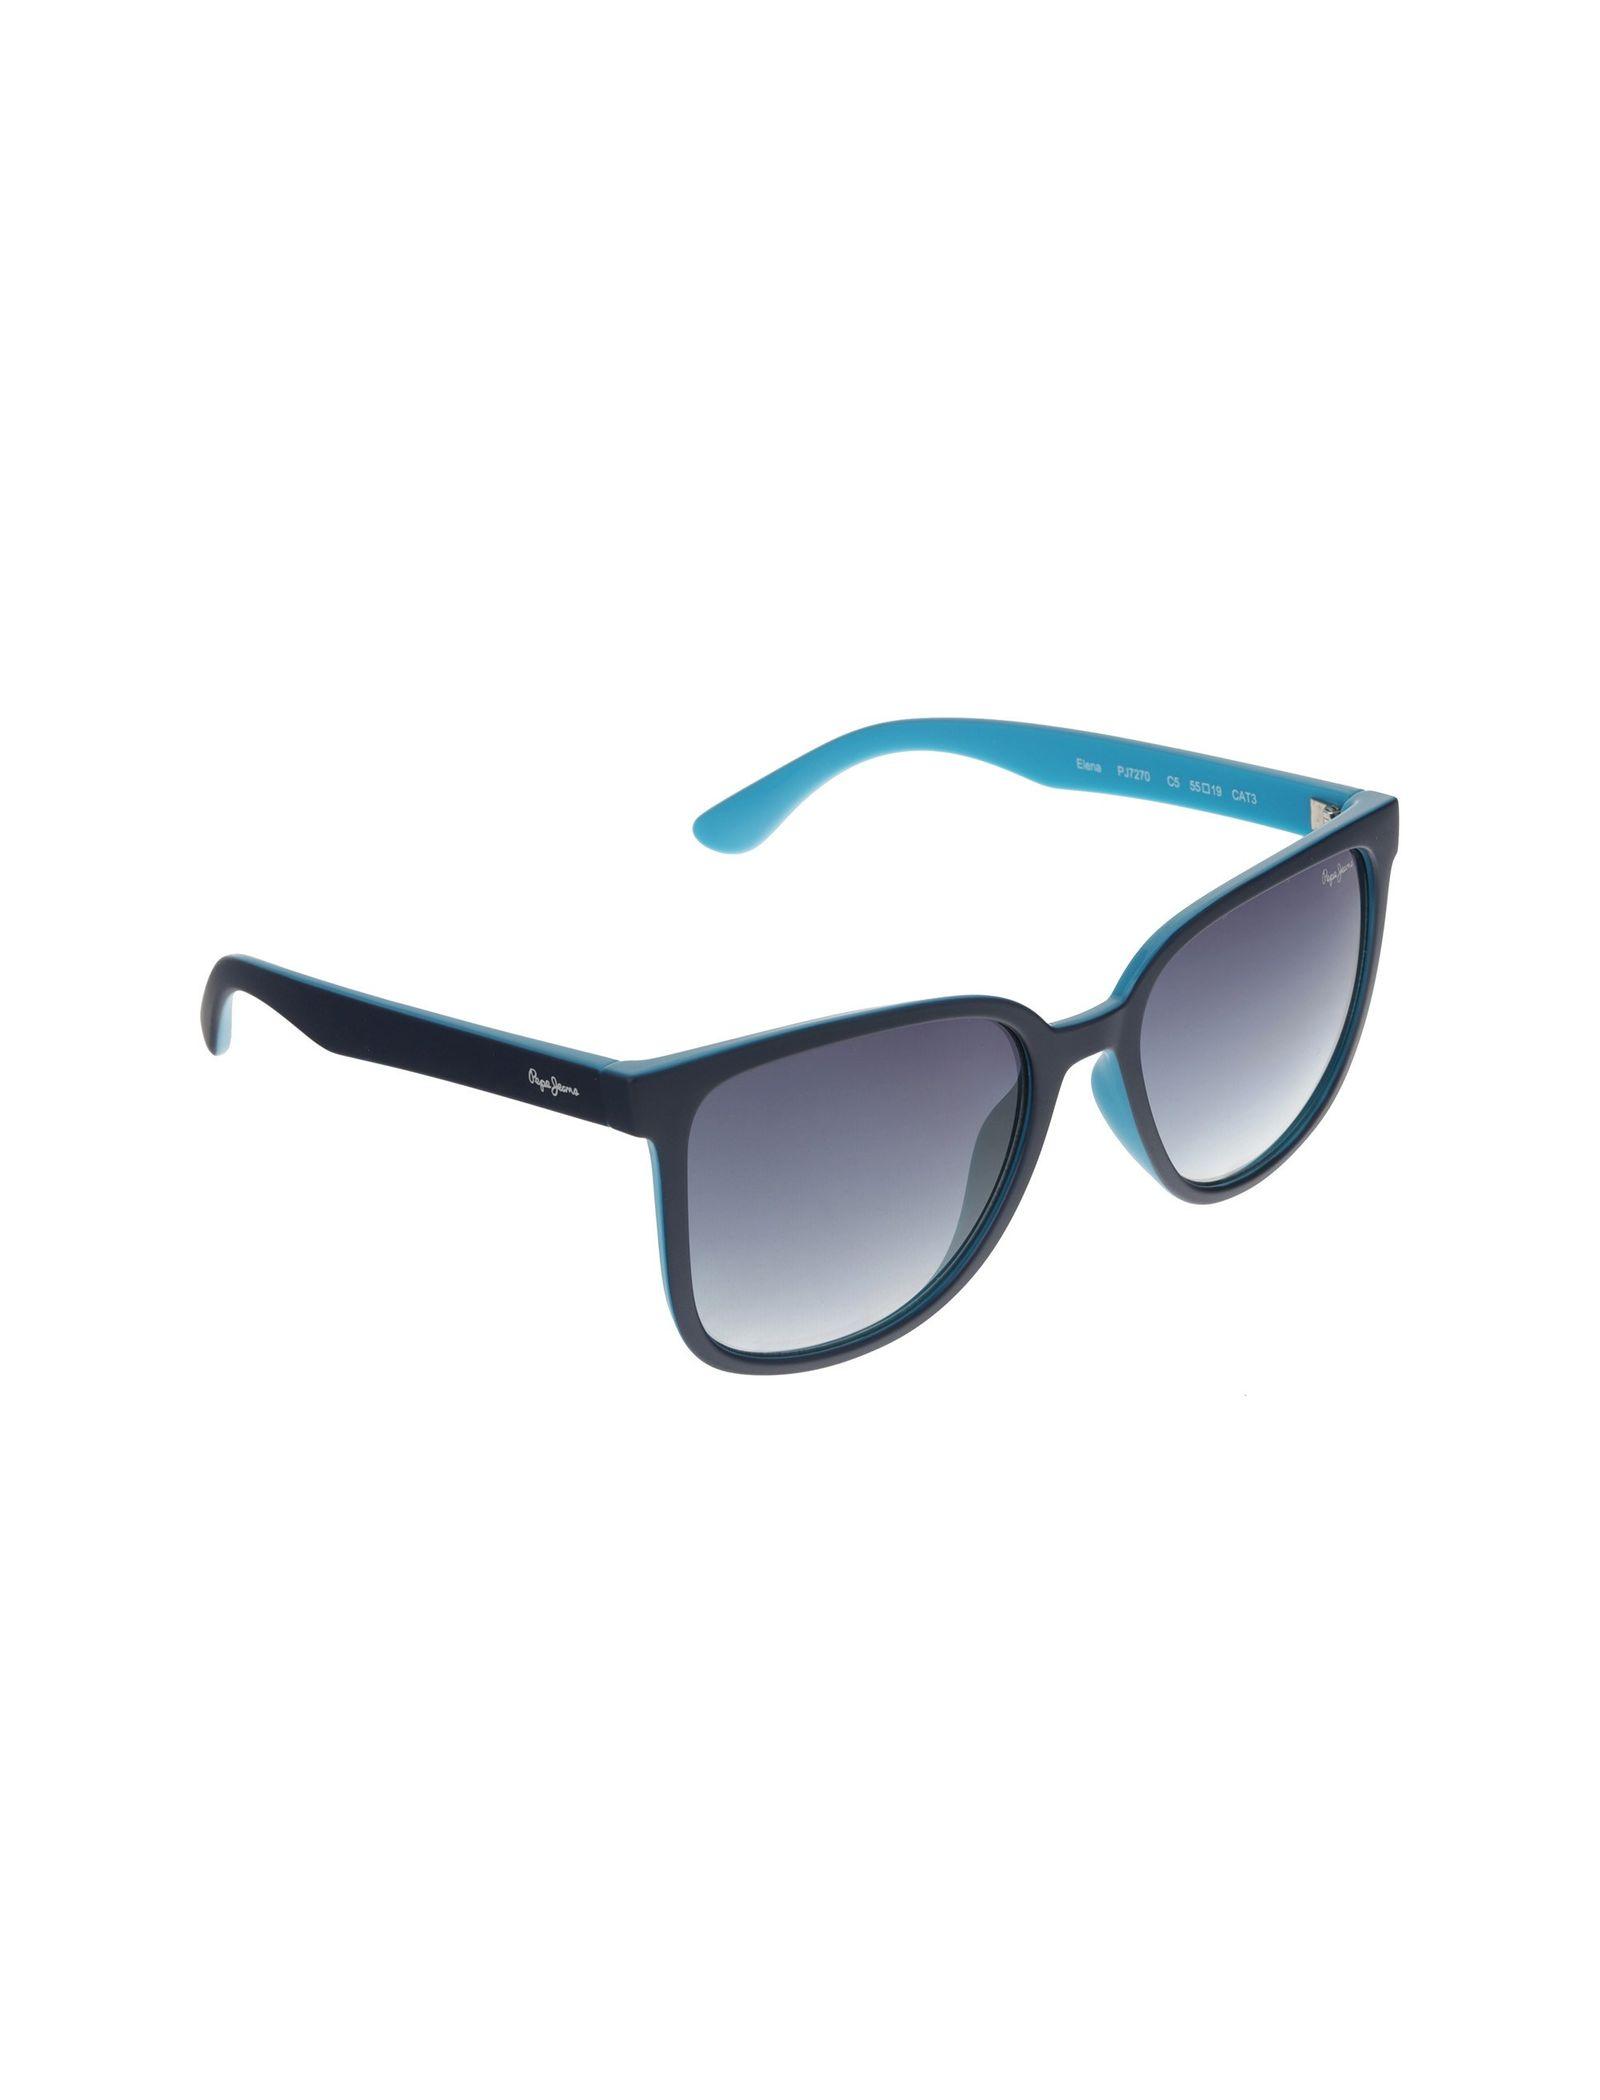 عینک آفتابی ویفرر زنانه - پپه جینز - سرمه اي - 2